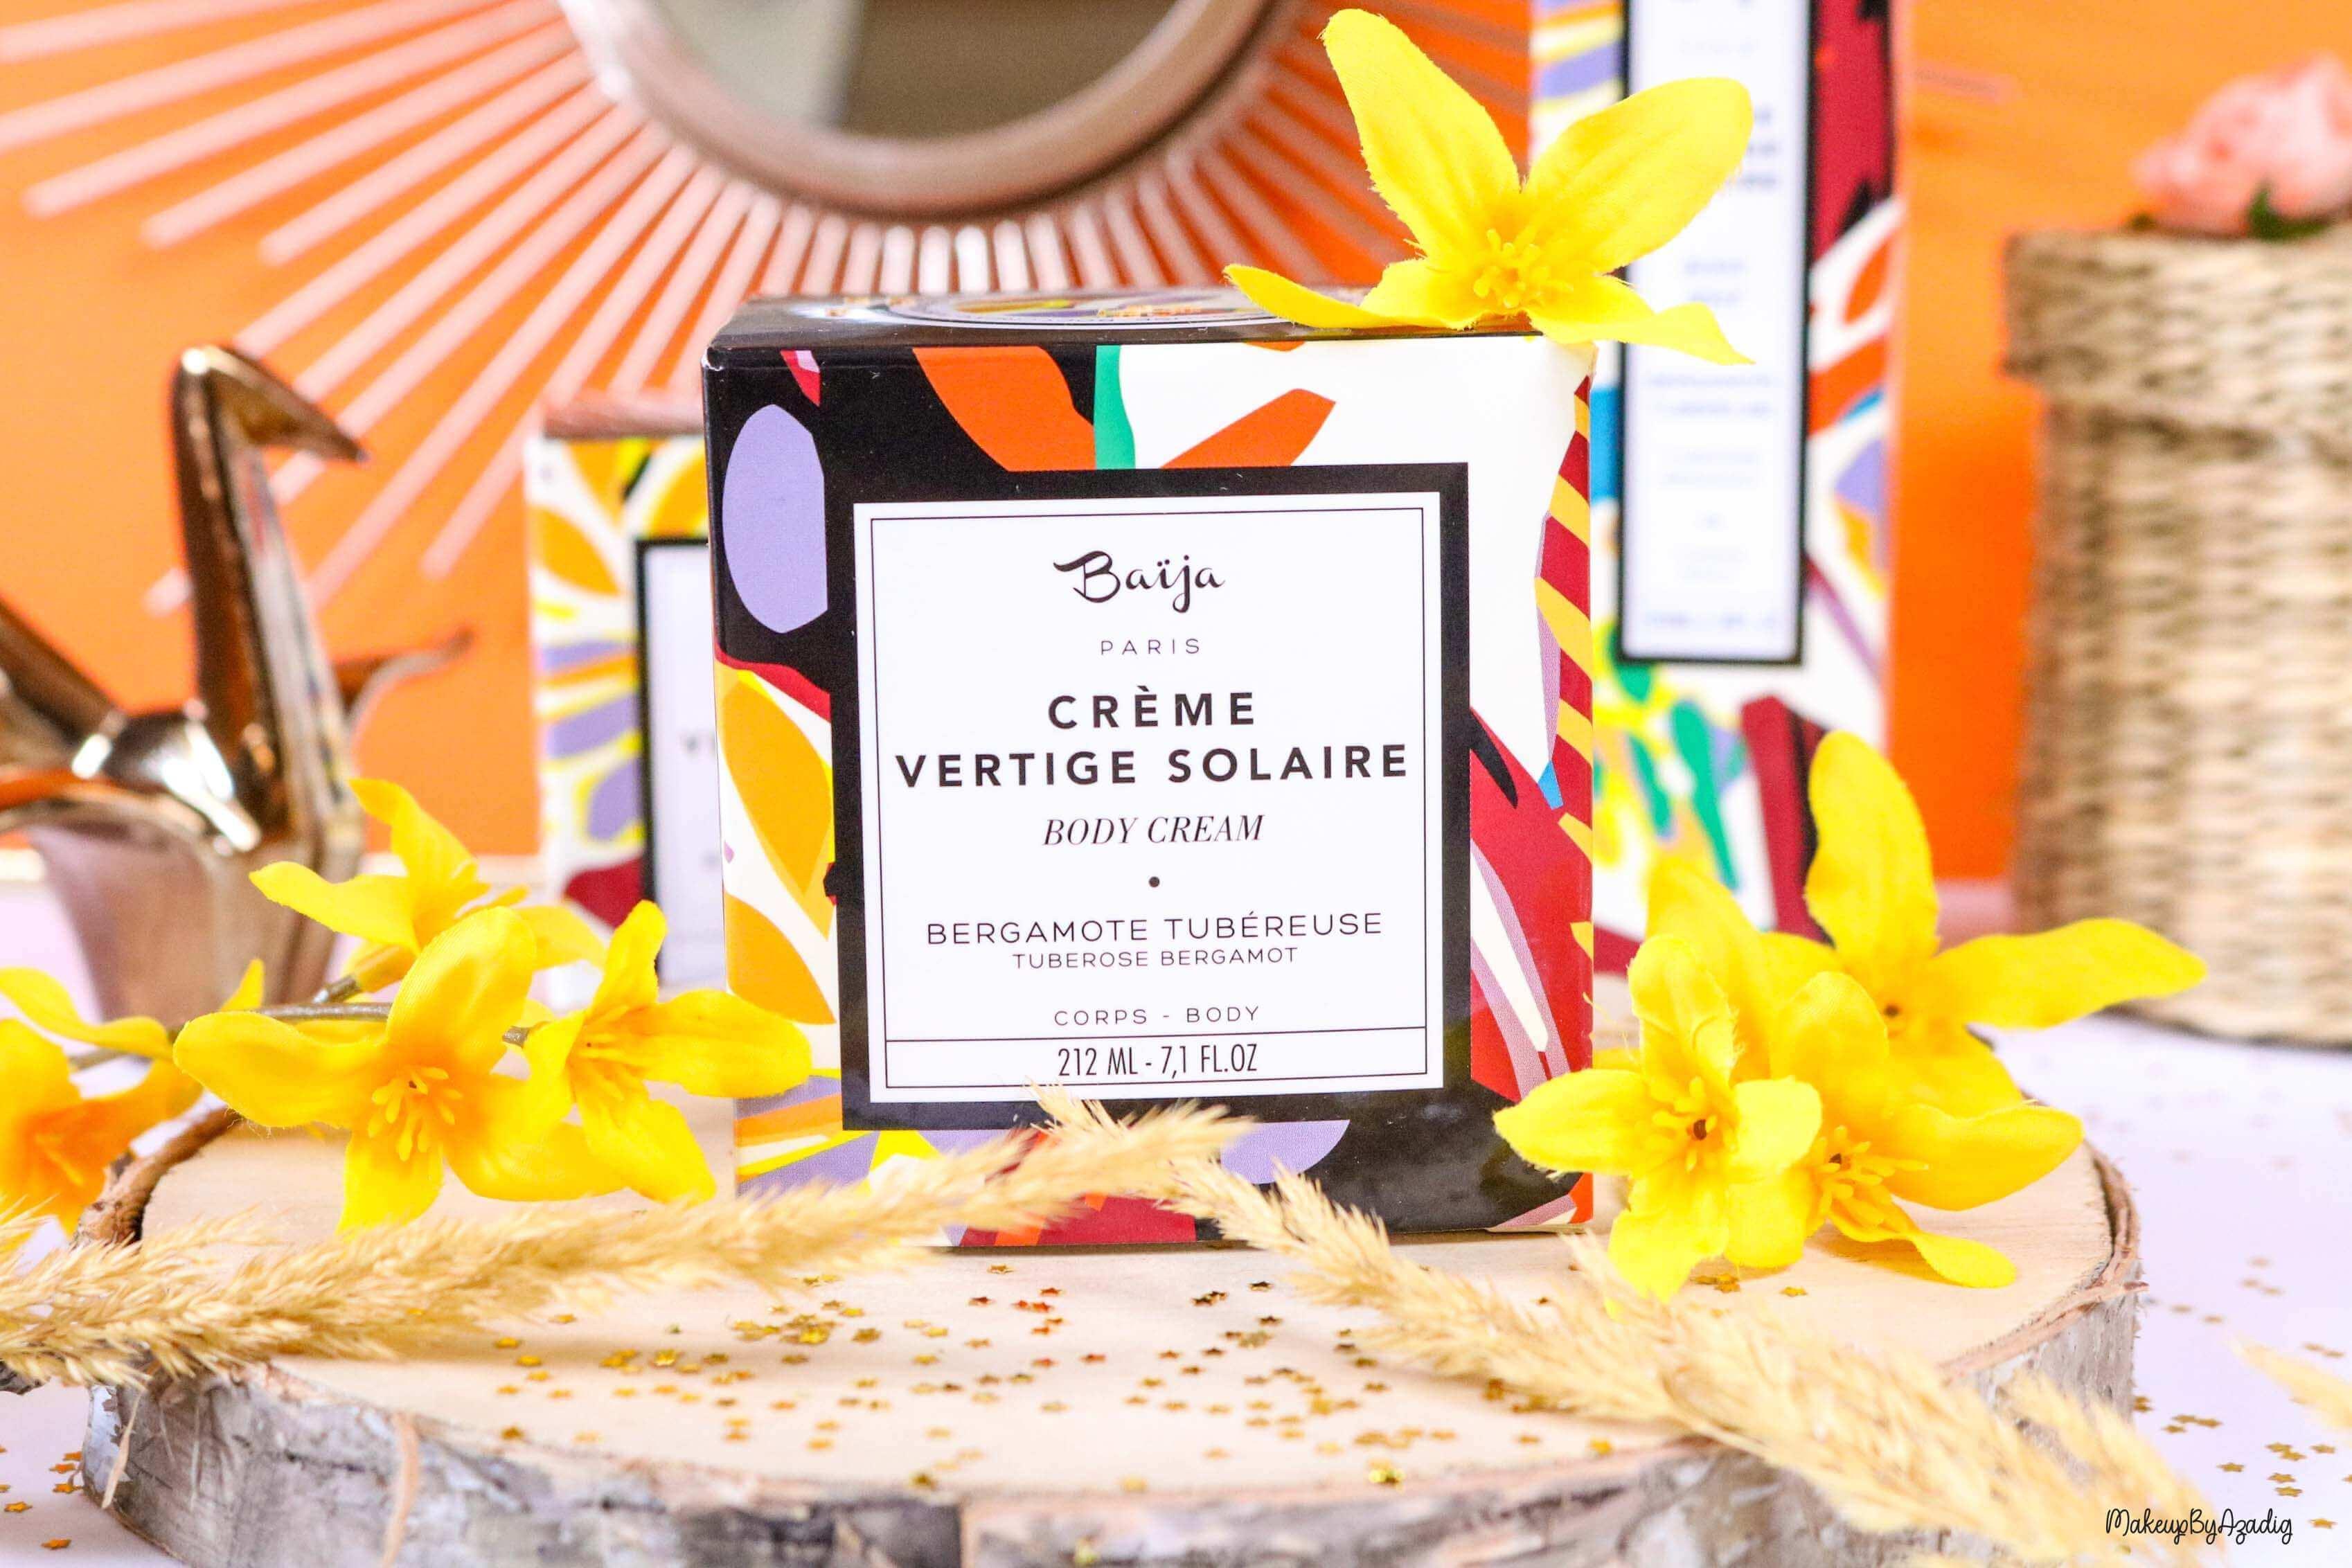 nouveaute-soin-baija-vertige-solaire-sephora-promo-code-gommage-creme-corps-brume-avis-prix-makeupbyazadig-qualite-packaging